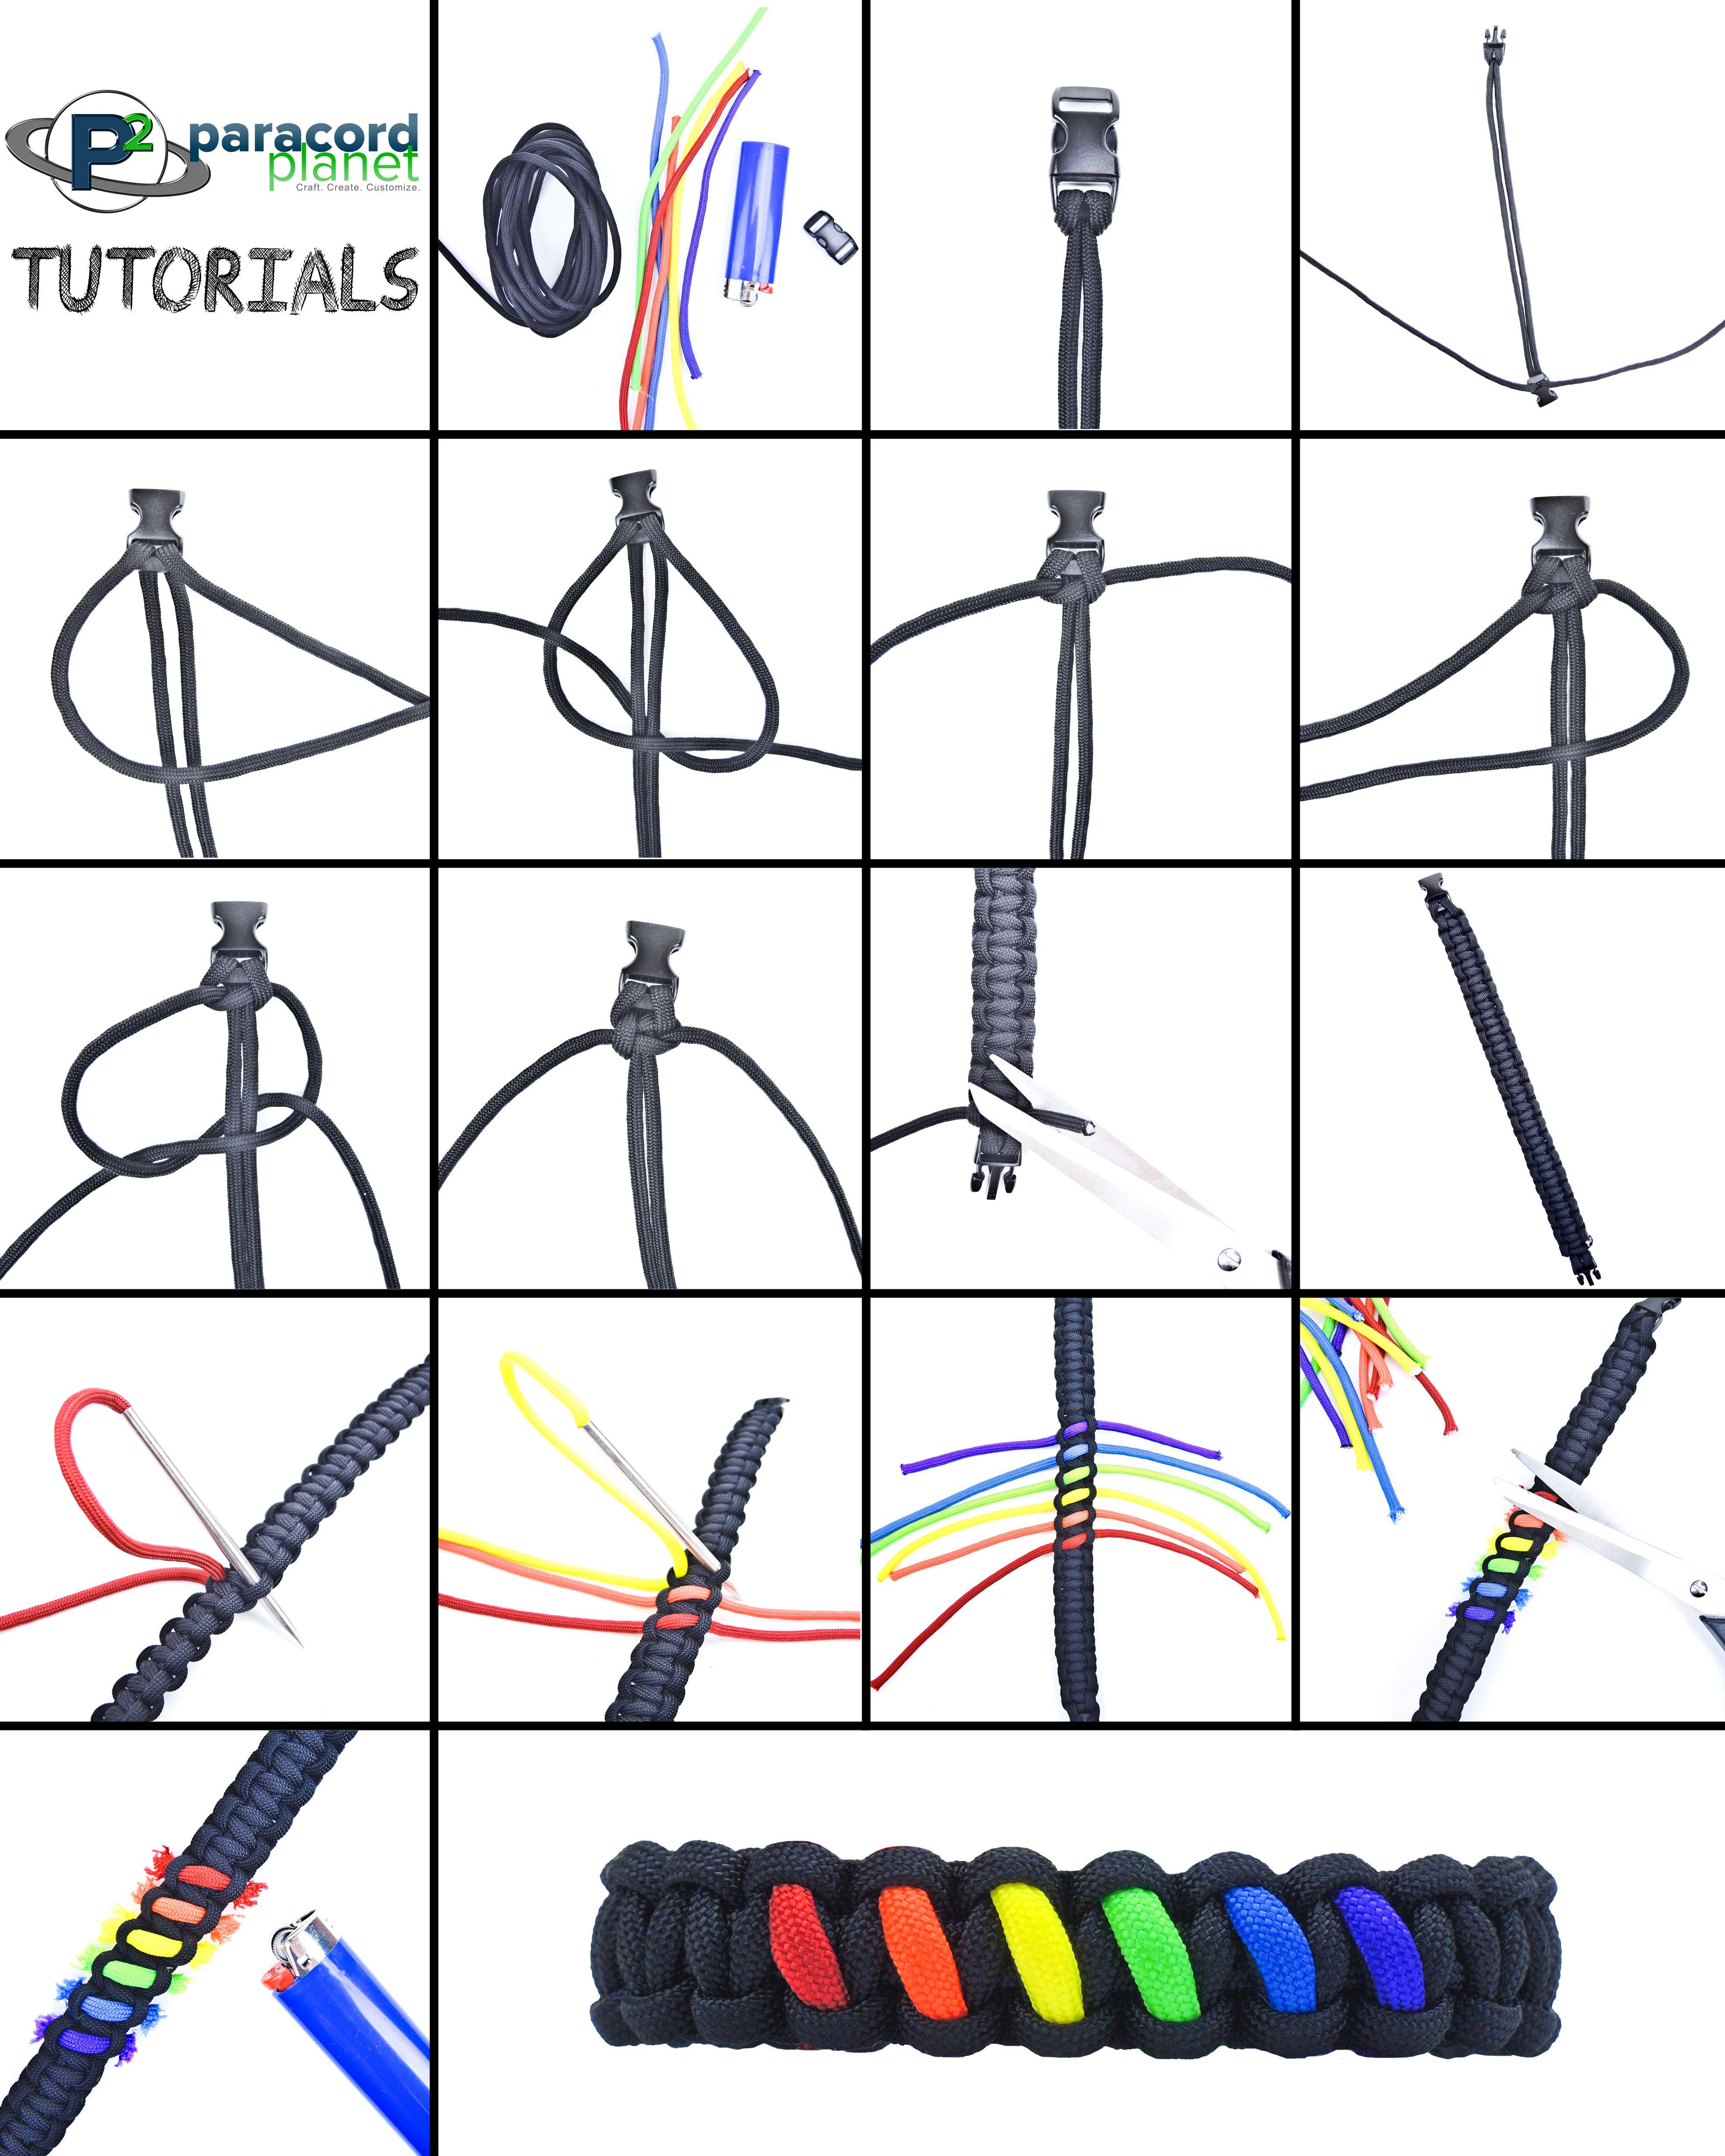 Basket Weave Paracord Bracelet Tutorial : Rainbow paracord bracelet tutorial tutorials